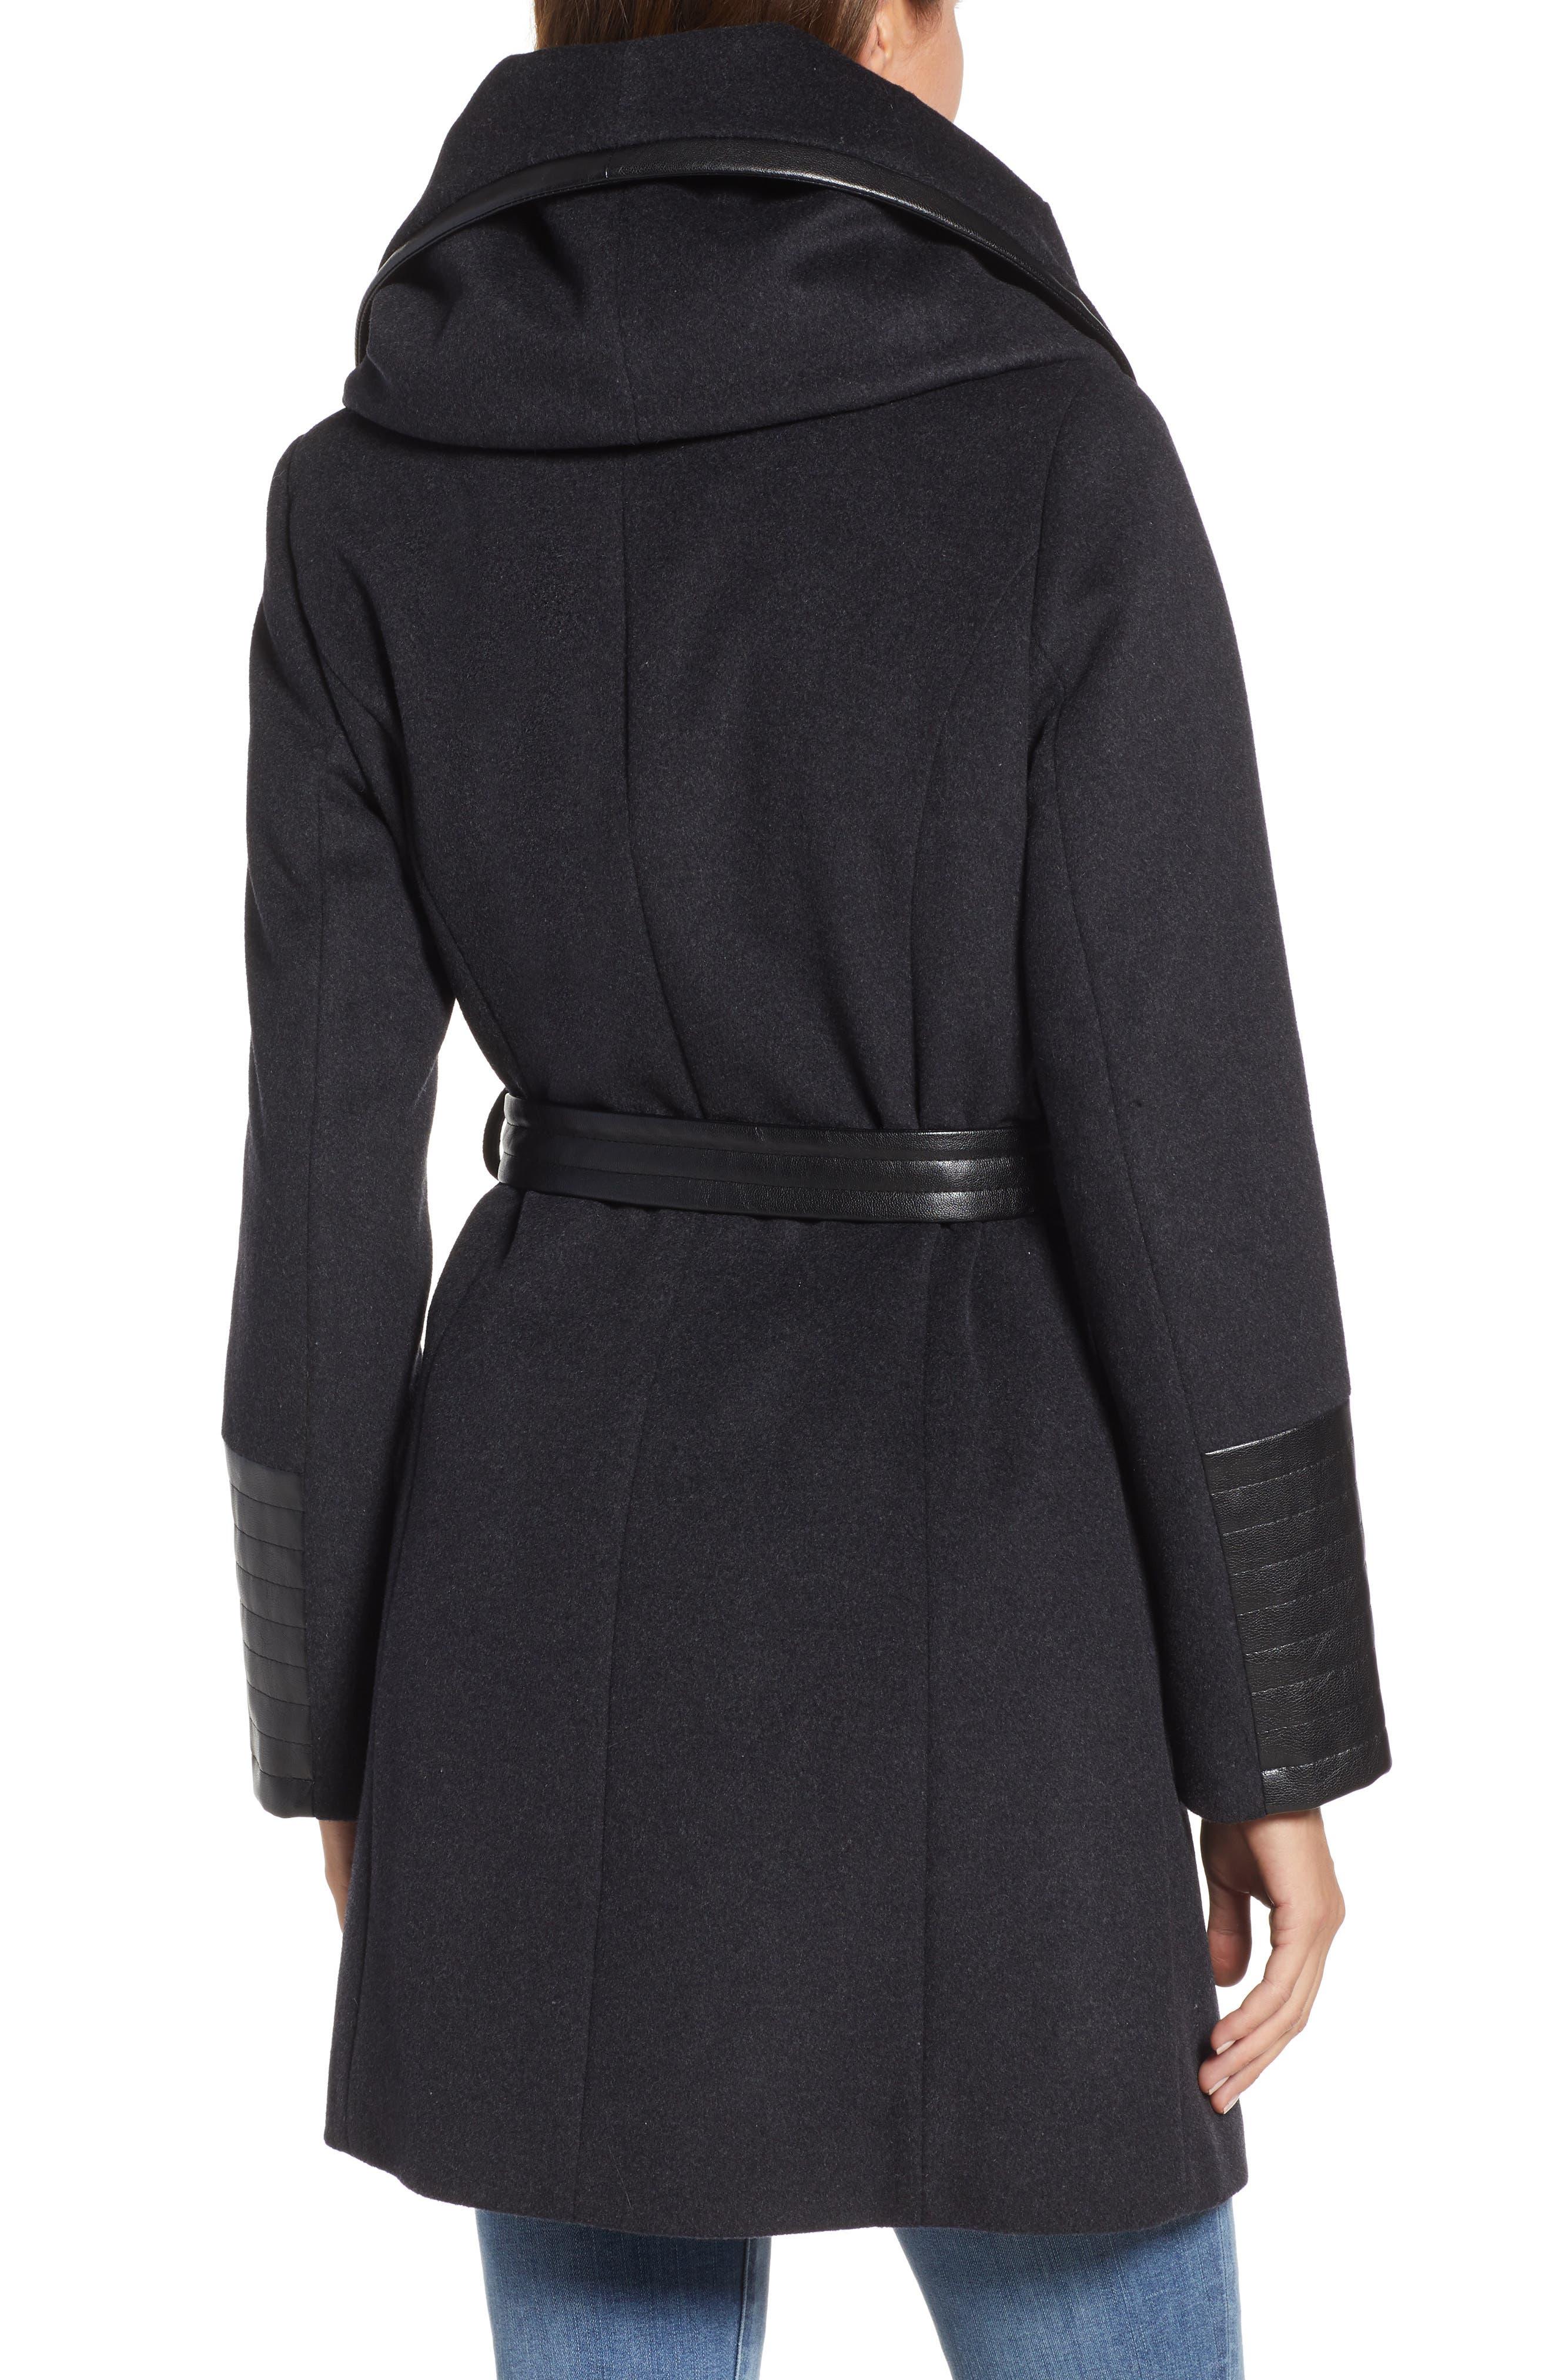 VIA SPIGA, Wool Blend Coat, Alternate thumbnail 2, color, CHARCOAL